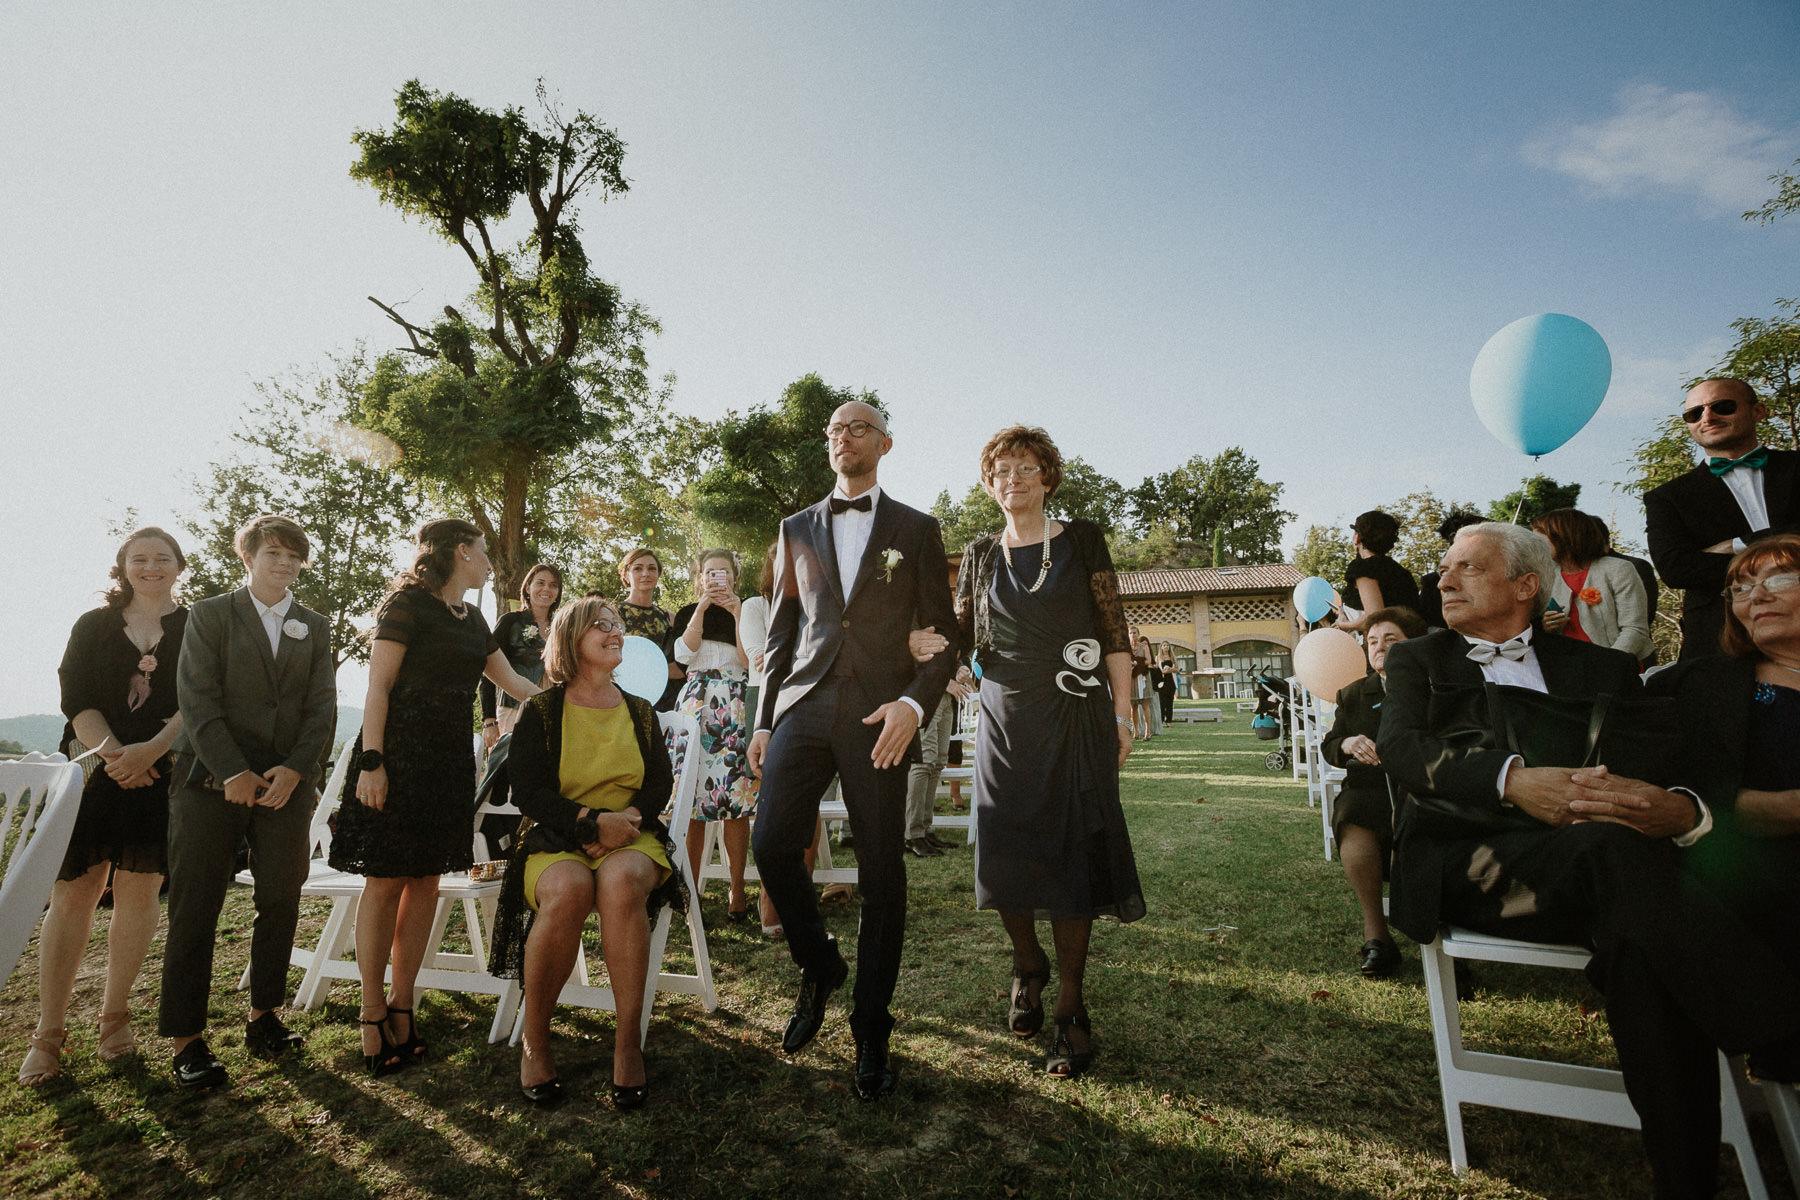 fotografo-matrimonio-monte-gesso-cerimonia-civile-sposo-francesco-ferrarini